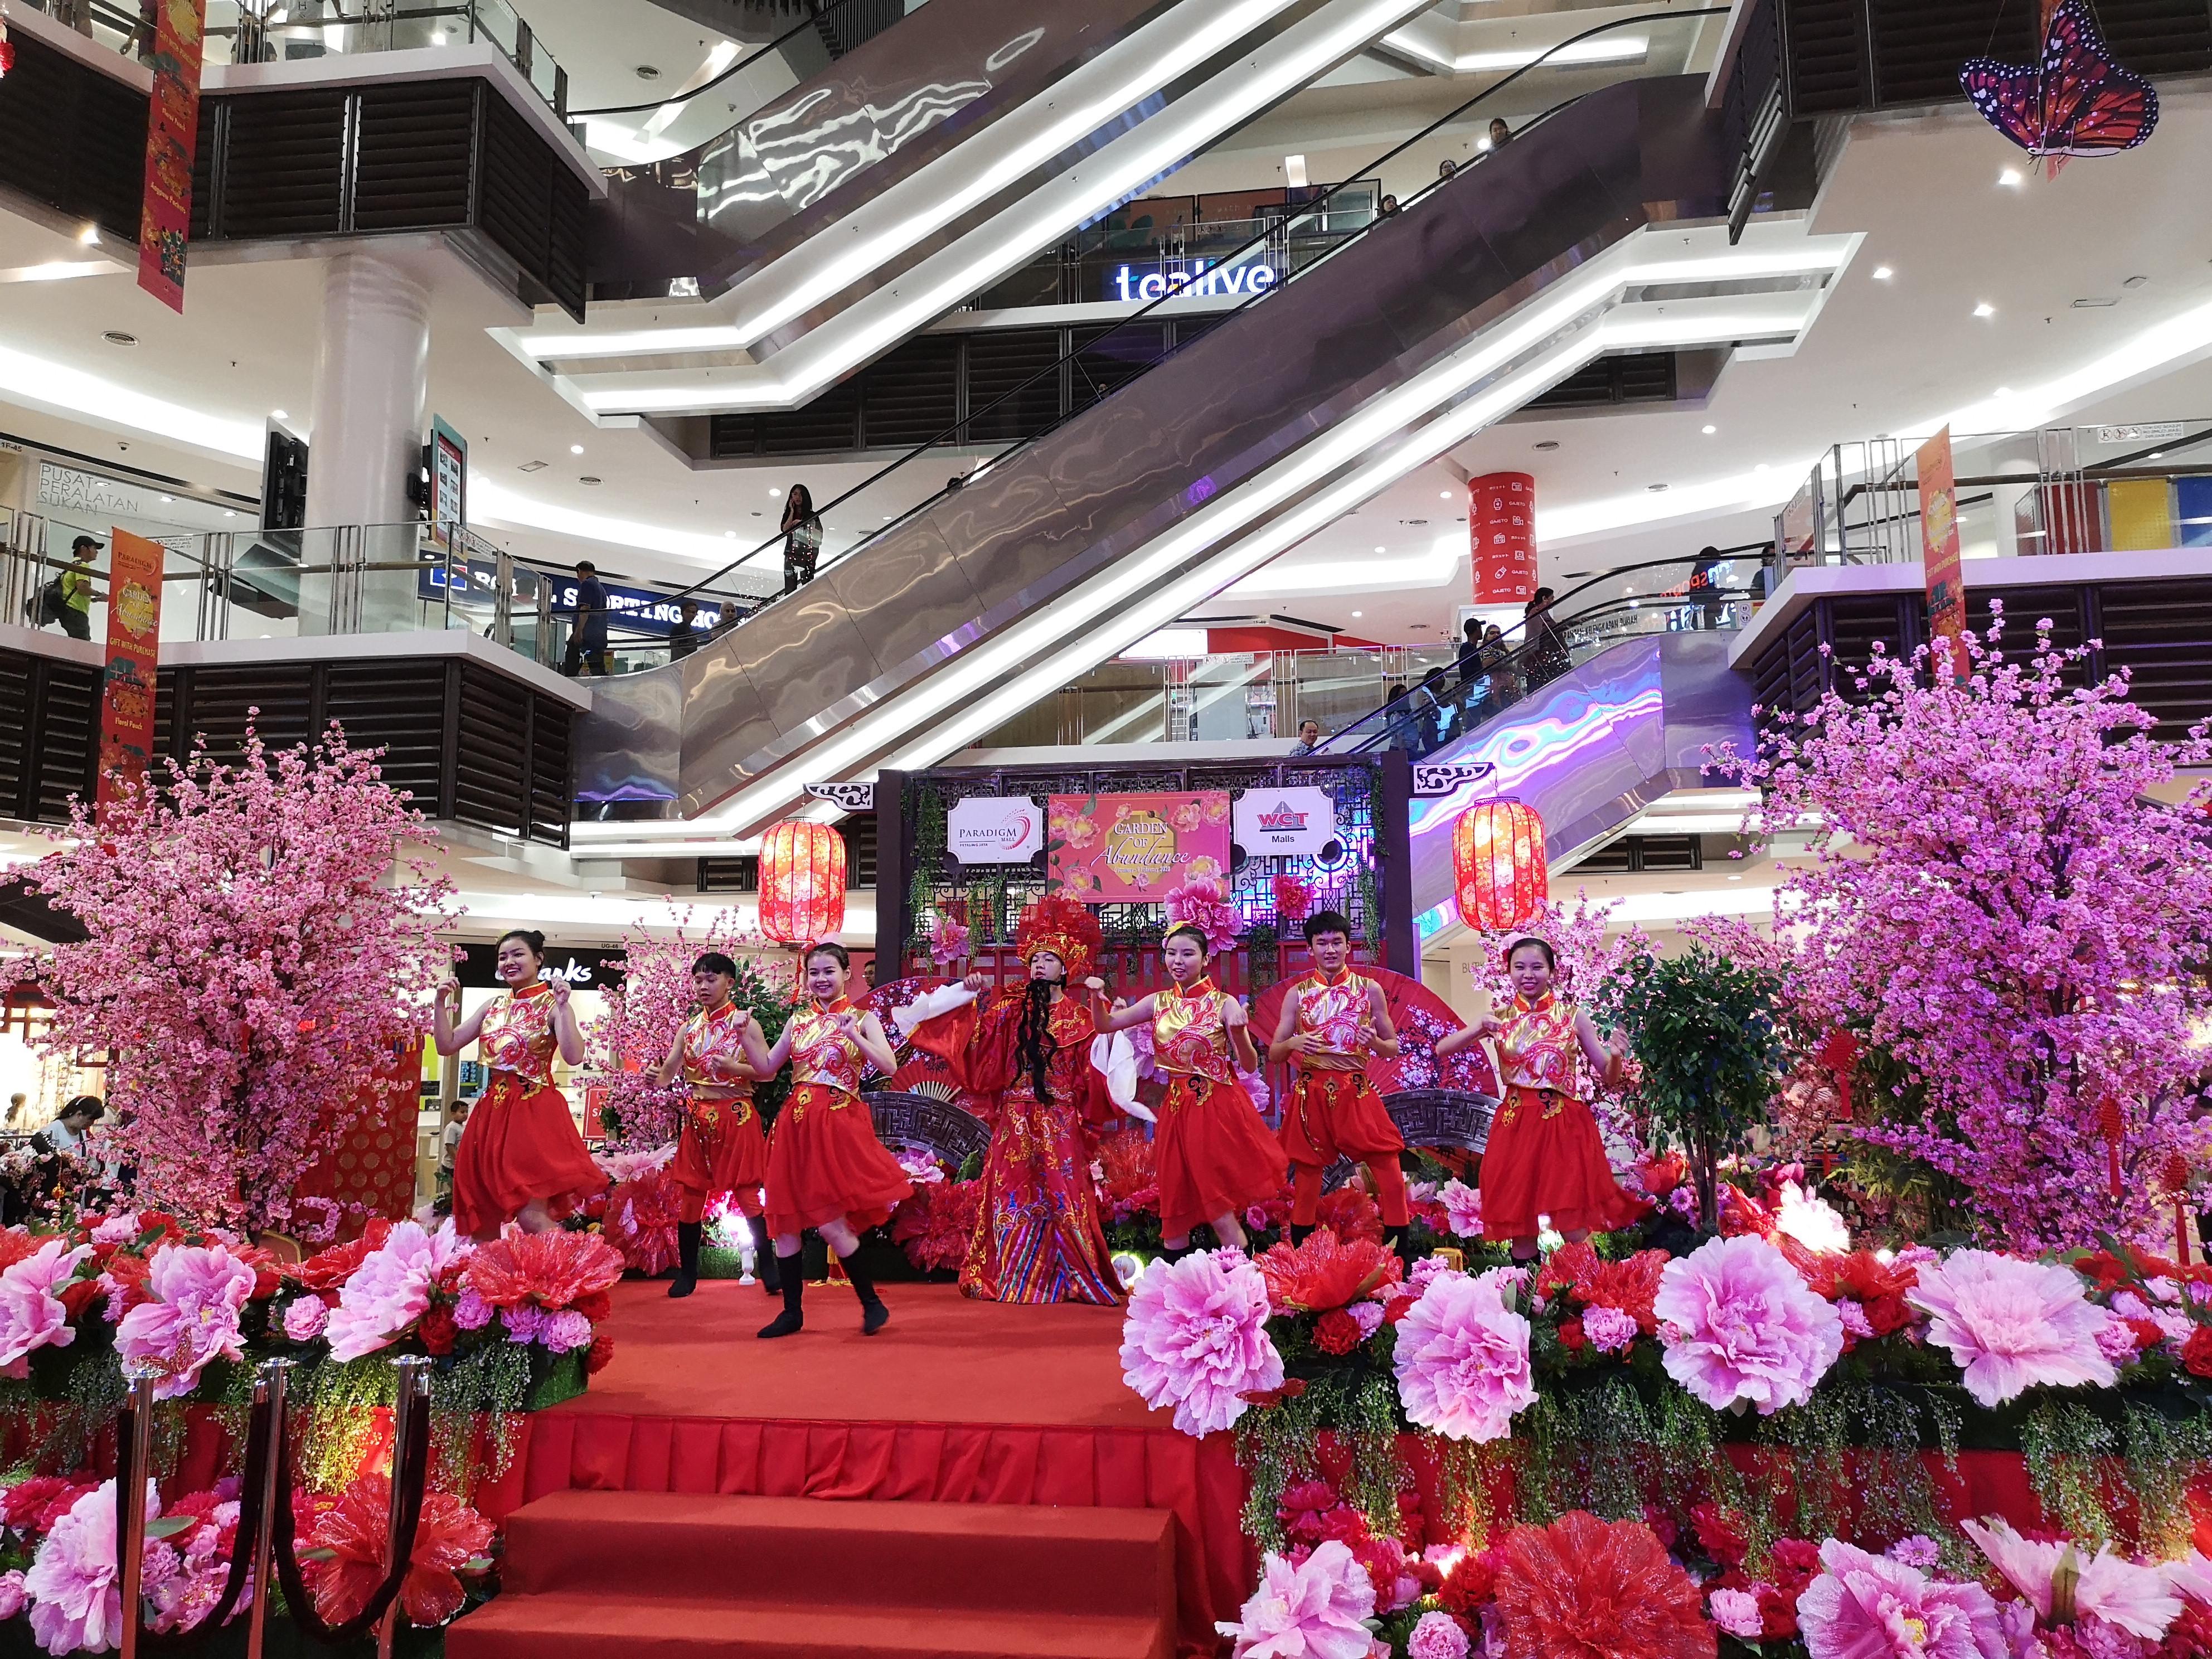 Image from Paradigm Mall Petaling Jaya